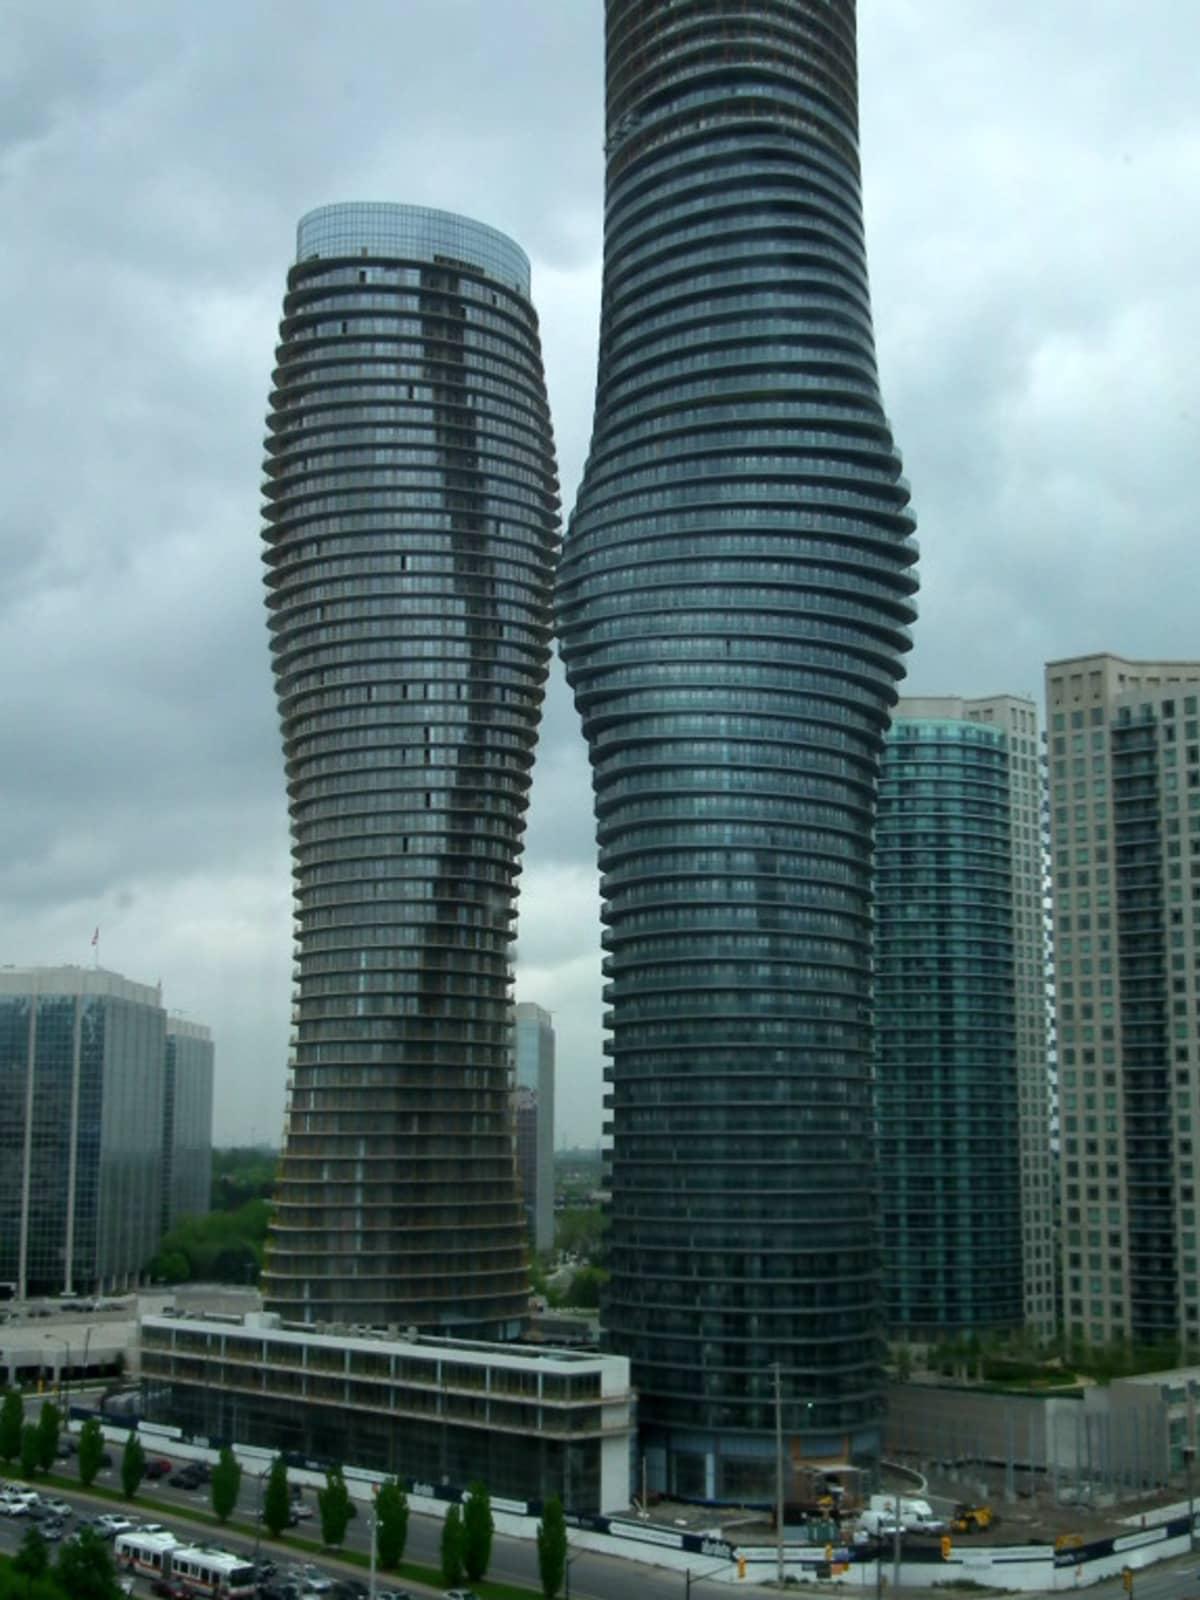 Marilyn Monroe Towers in Canada